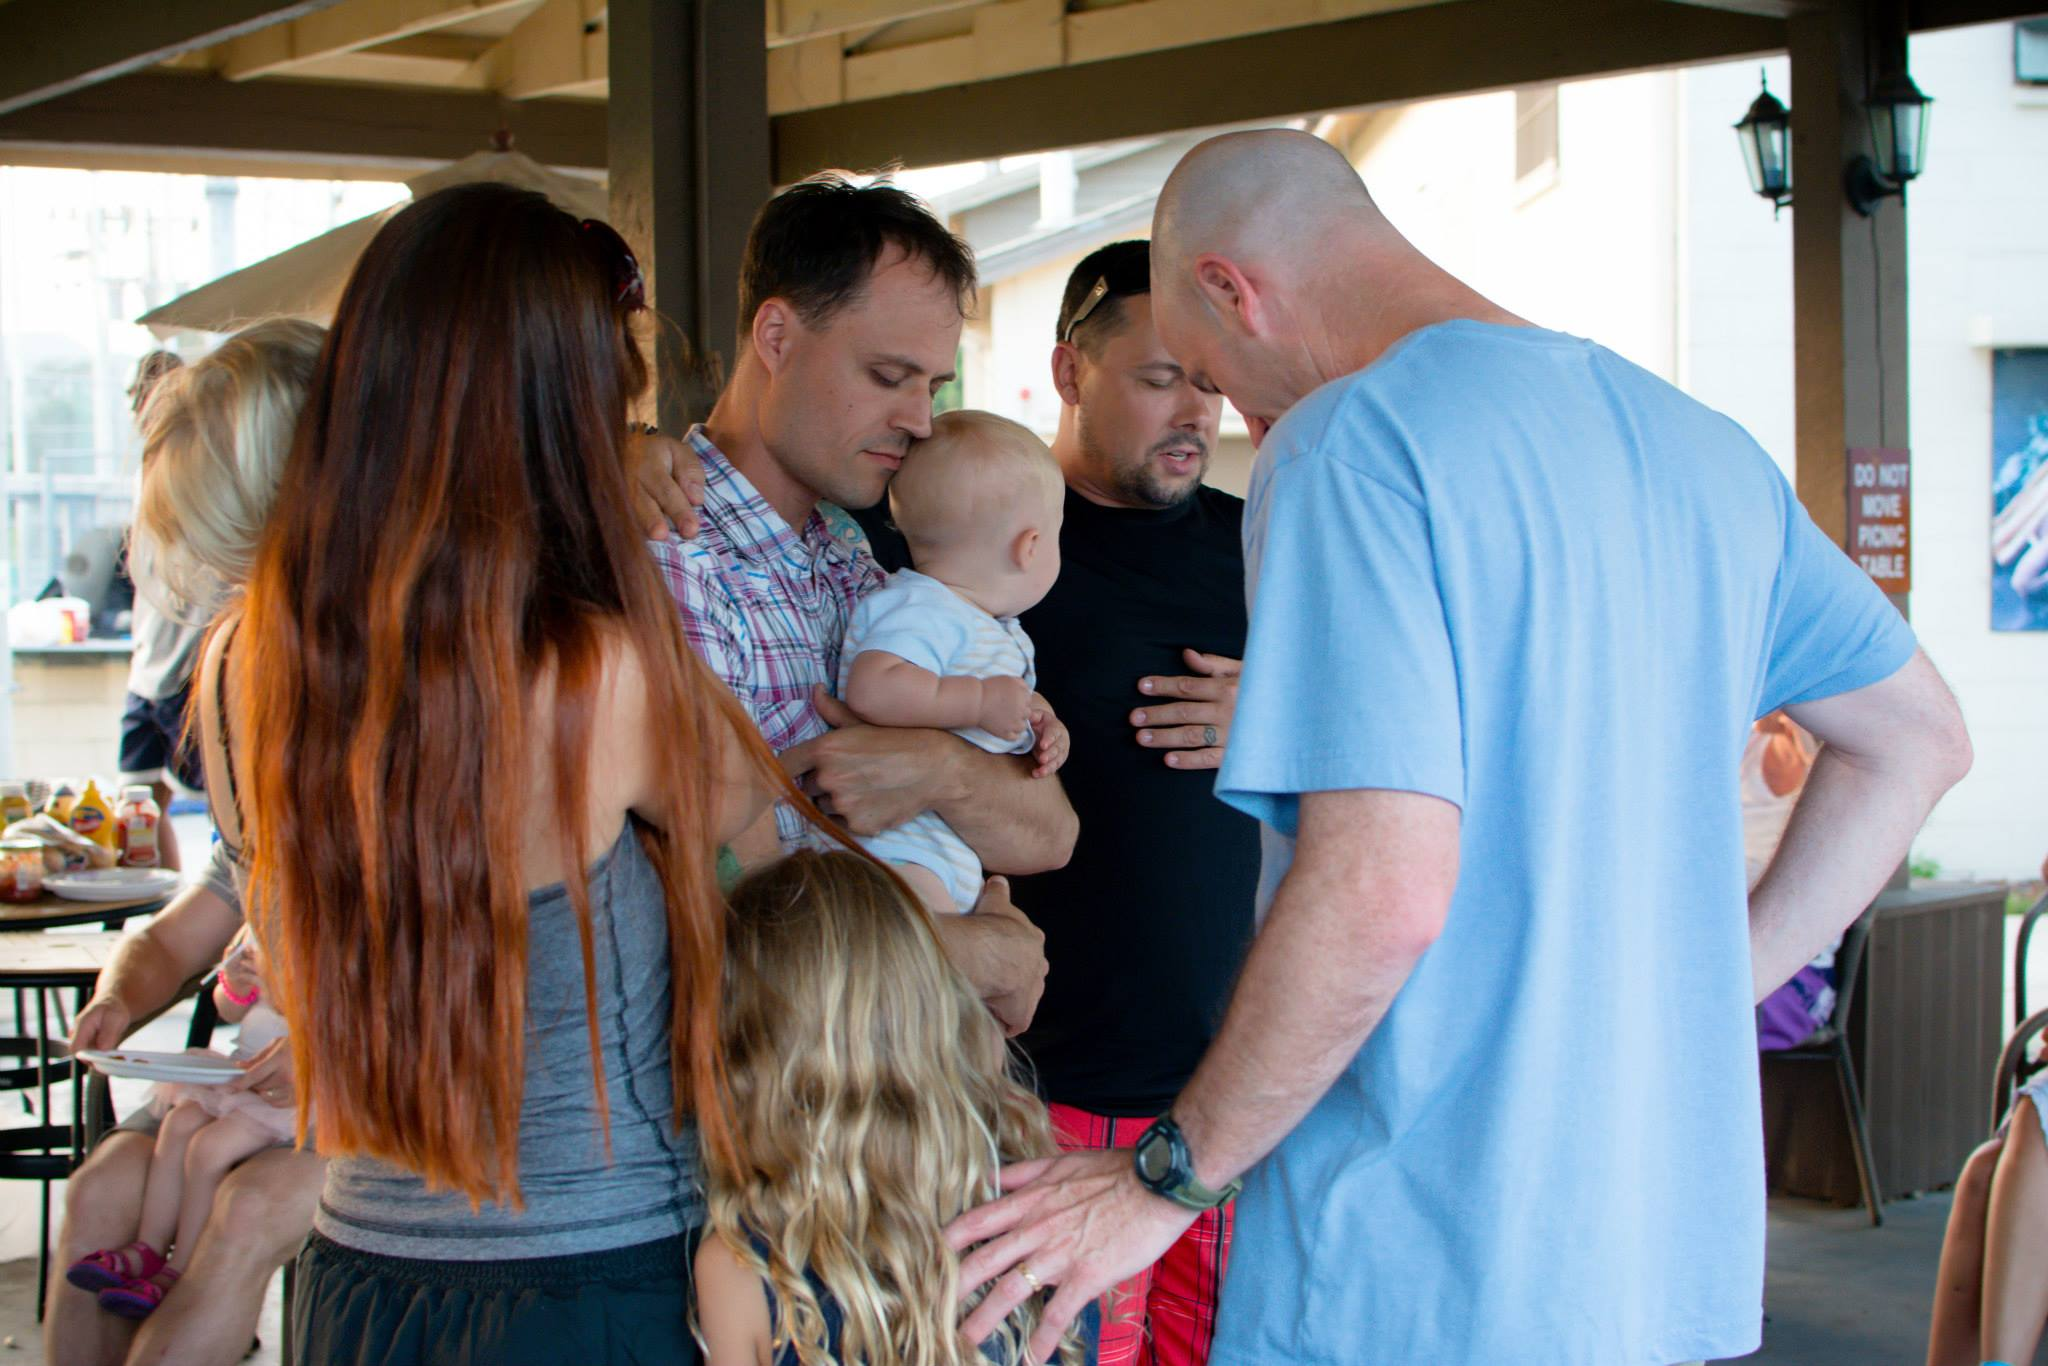 Praying for Michael's family